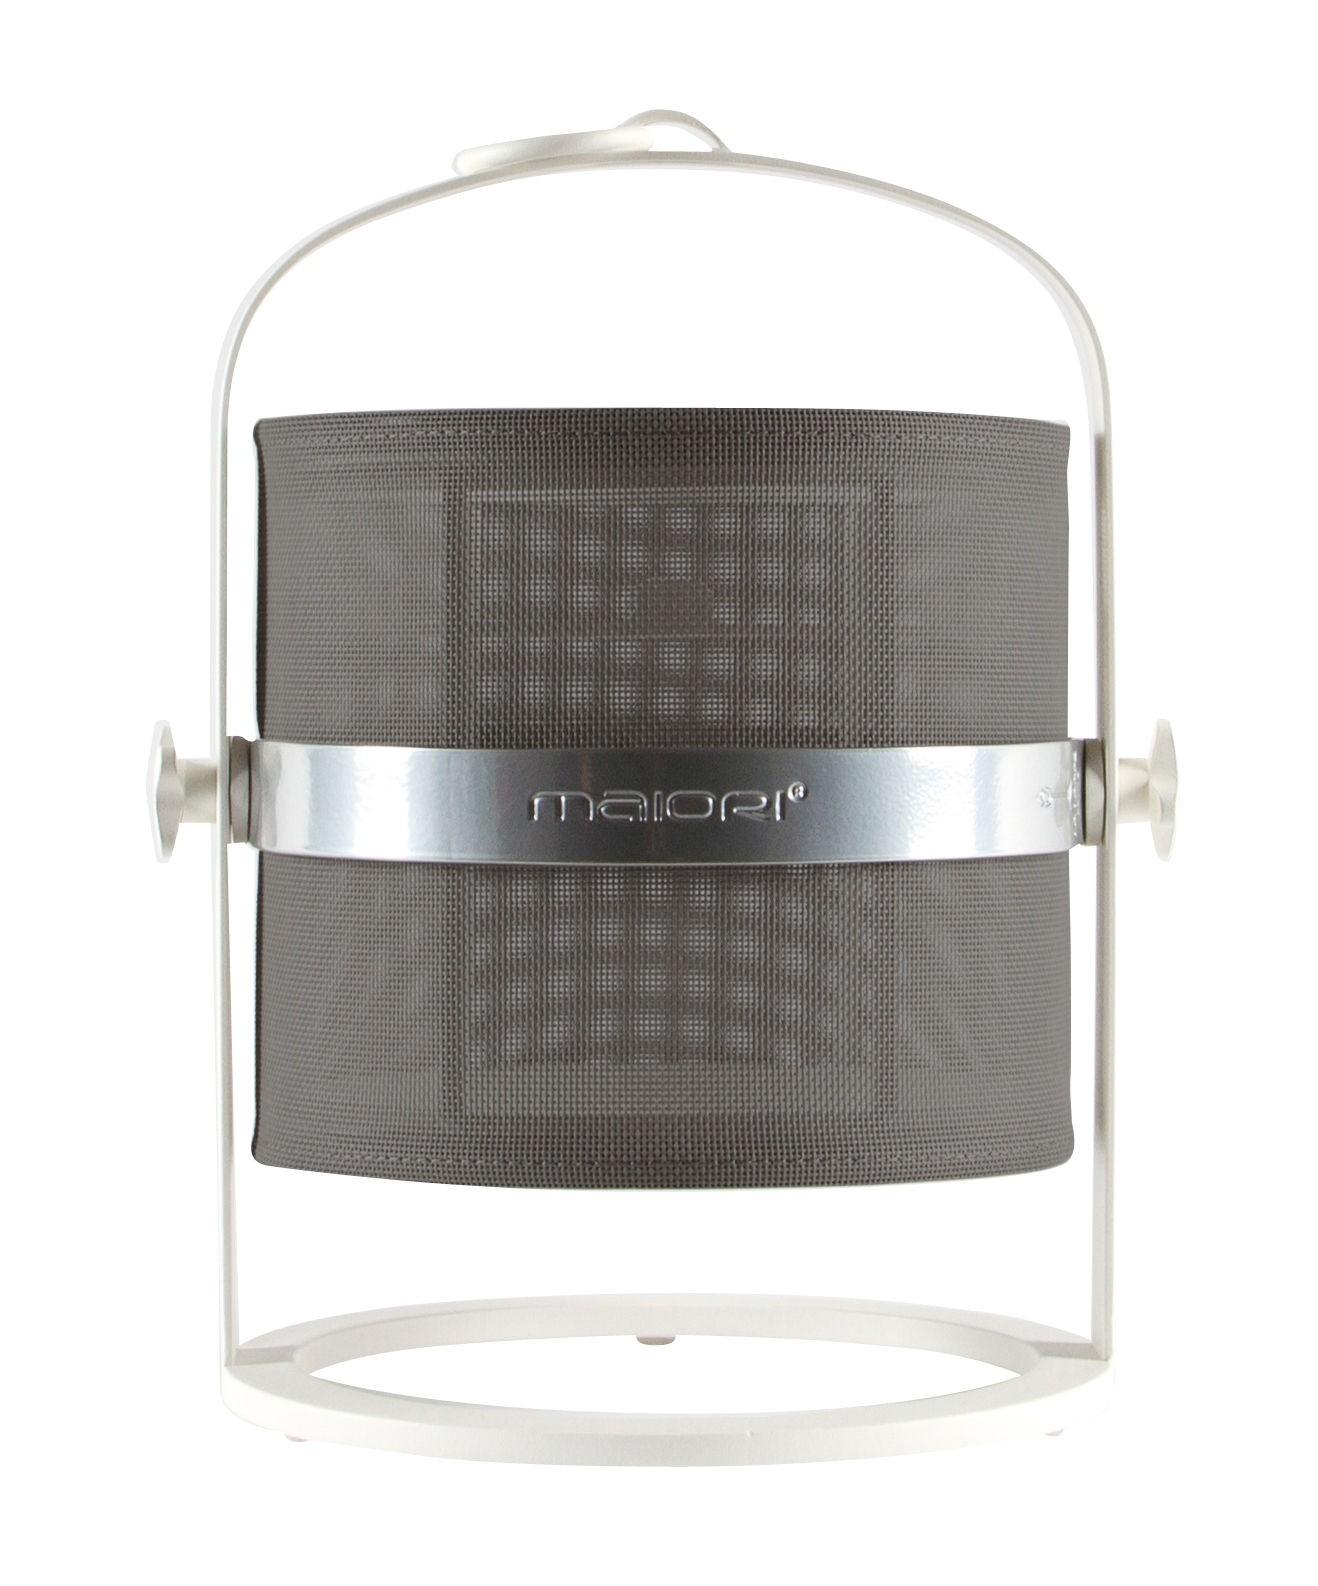 la lampe petite de maiori kaki structure blanc. Black Bedroom Furniture Sets. Home Design Ideas